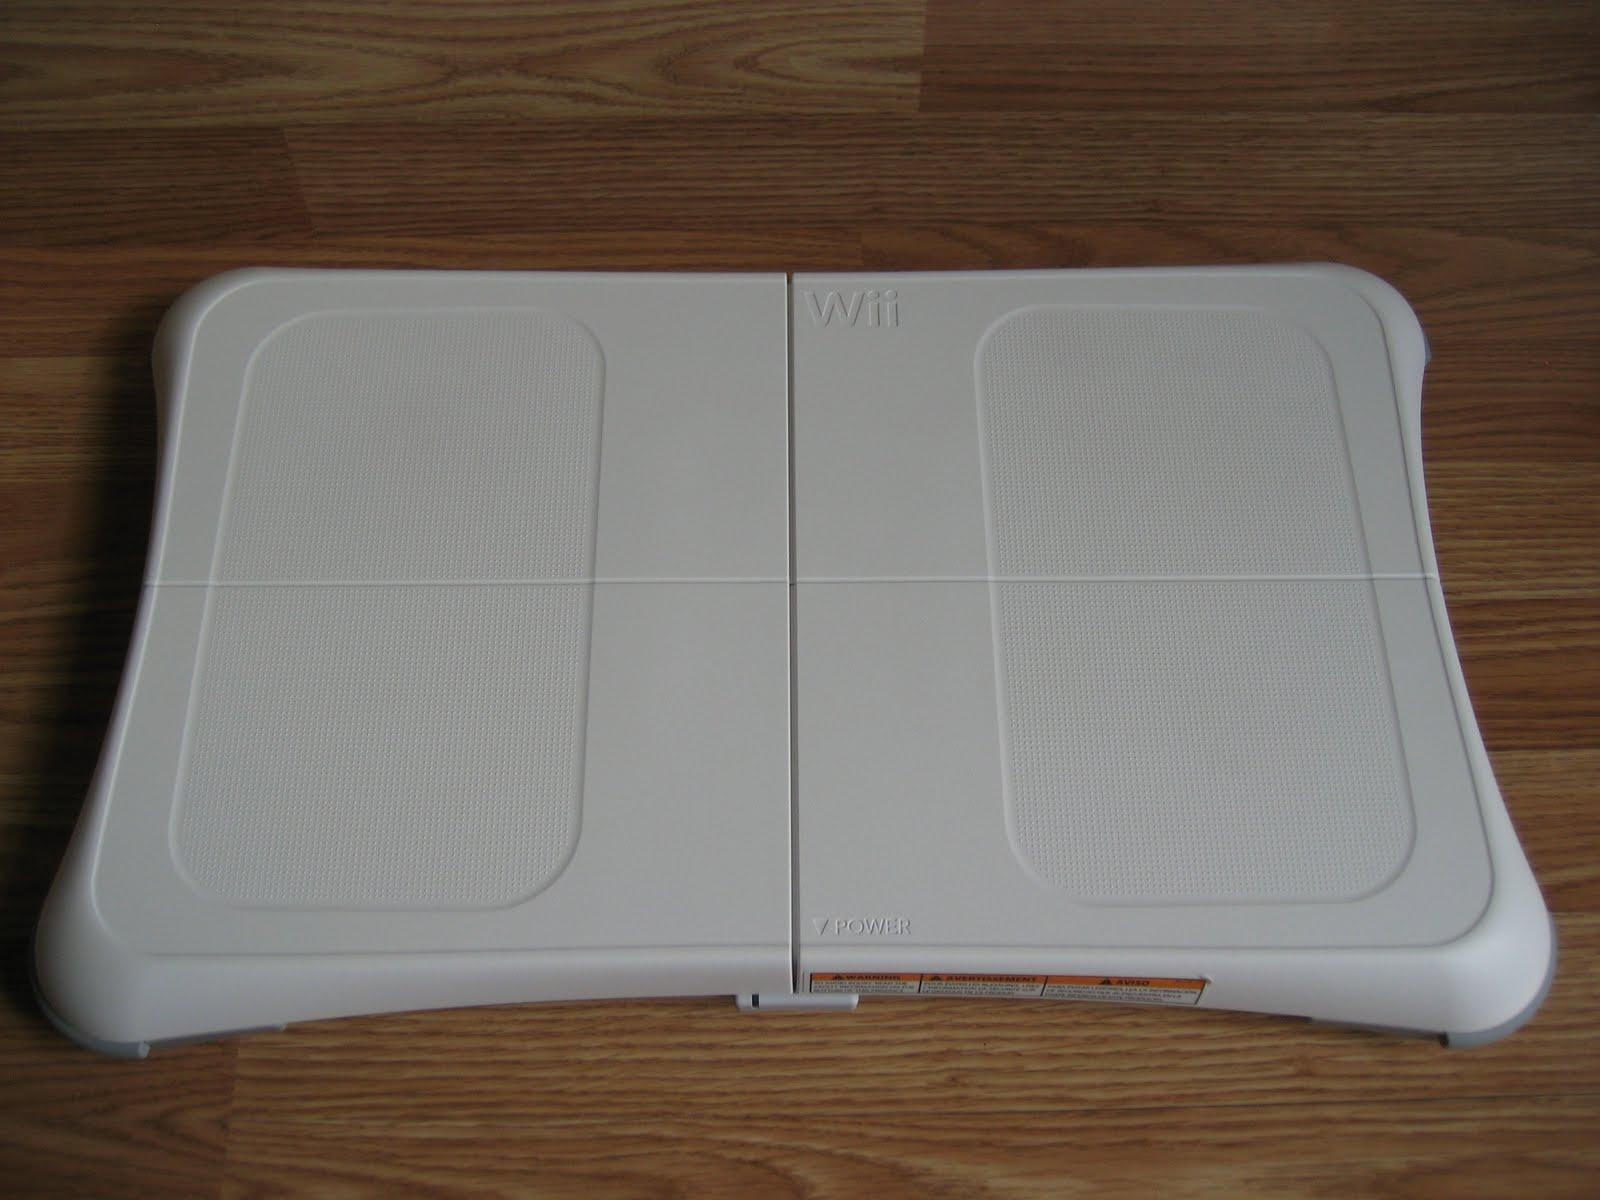 Noboxtospeakof ( No Box To Speak Of ): Wii Fit Balance ...